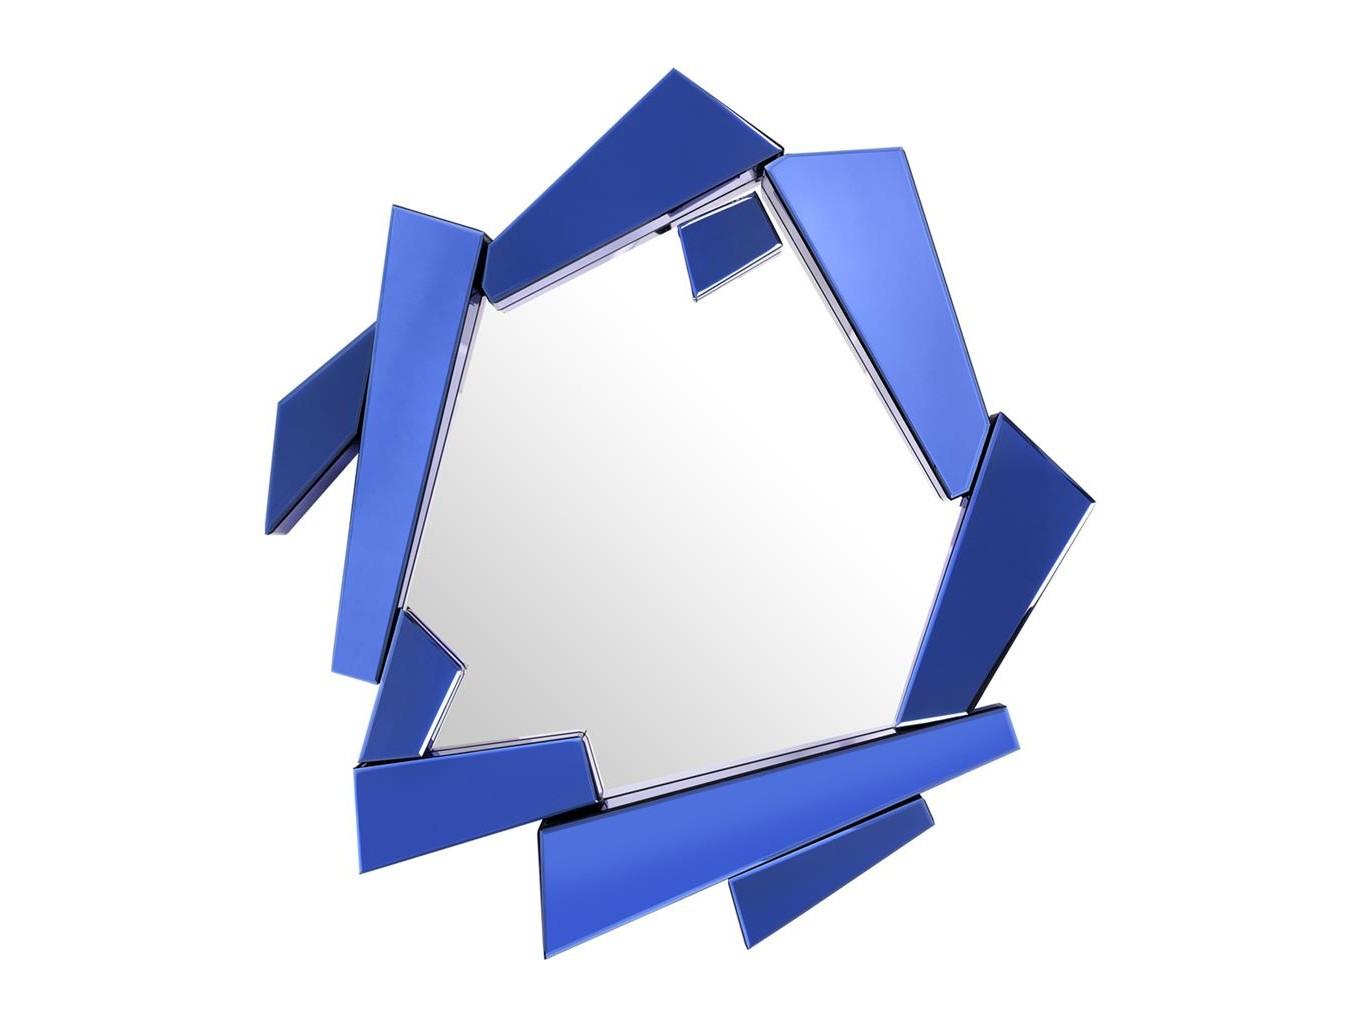 Зеркало CellinoНастенные зеркала<br><br><br>Material: Стекло<br>Ширина см: 102.0<br>Высота см: 123.0